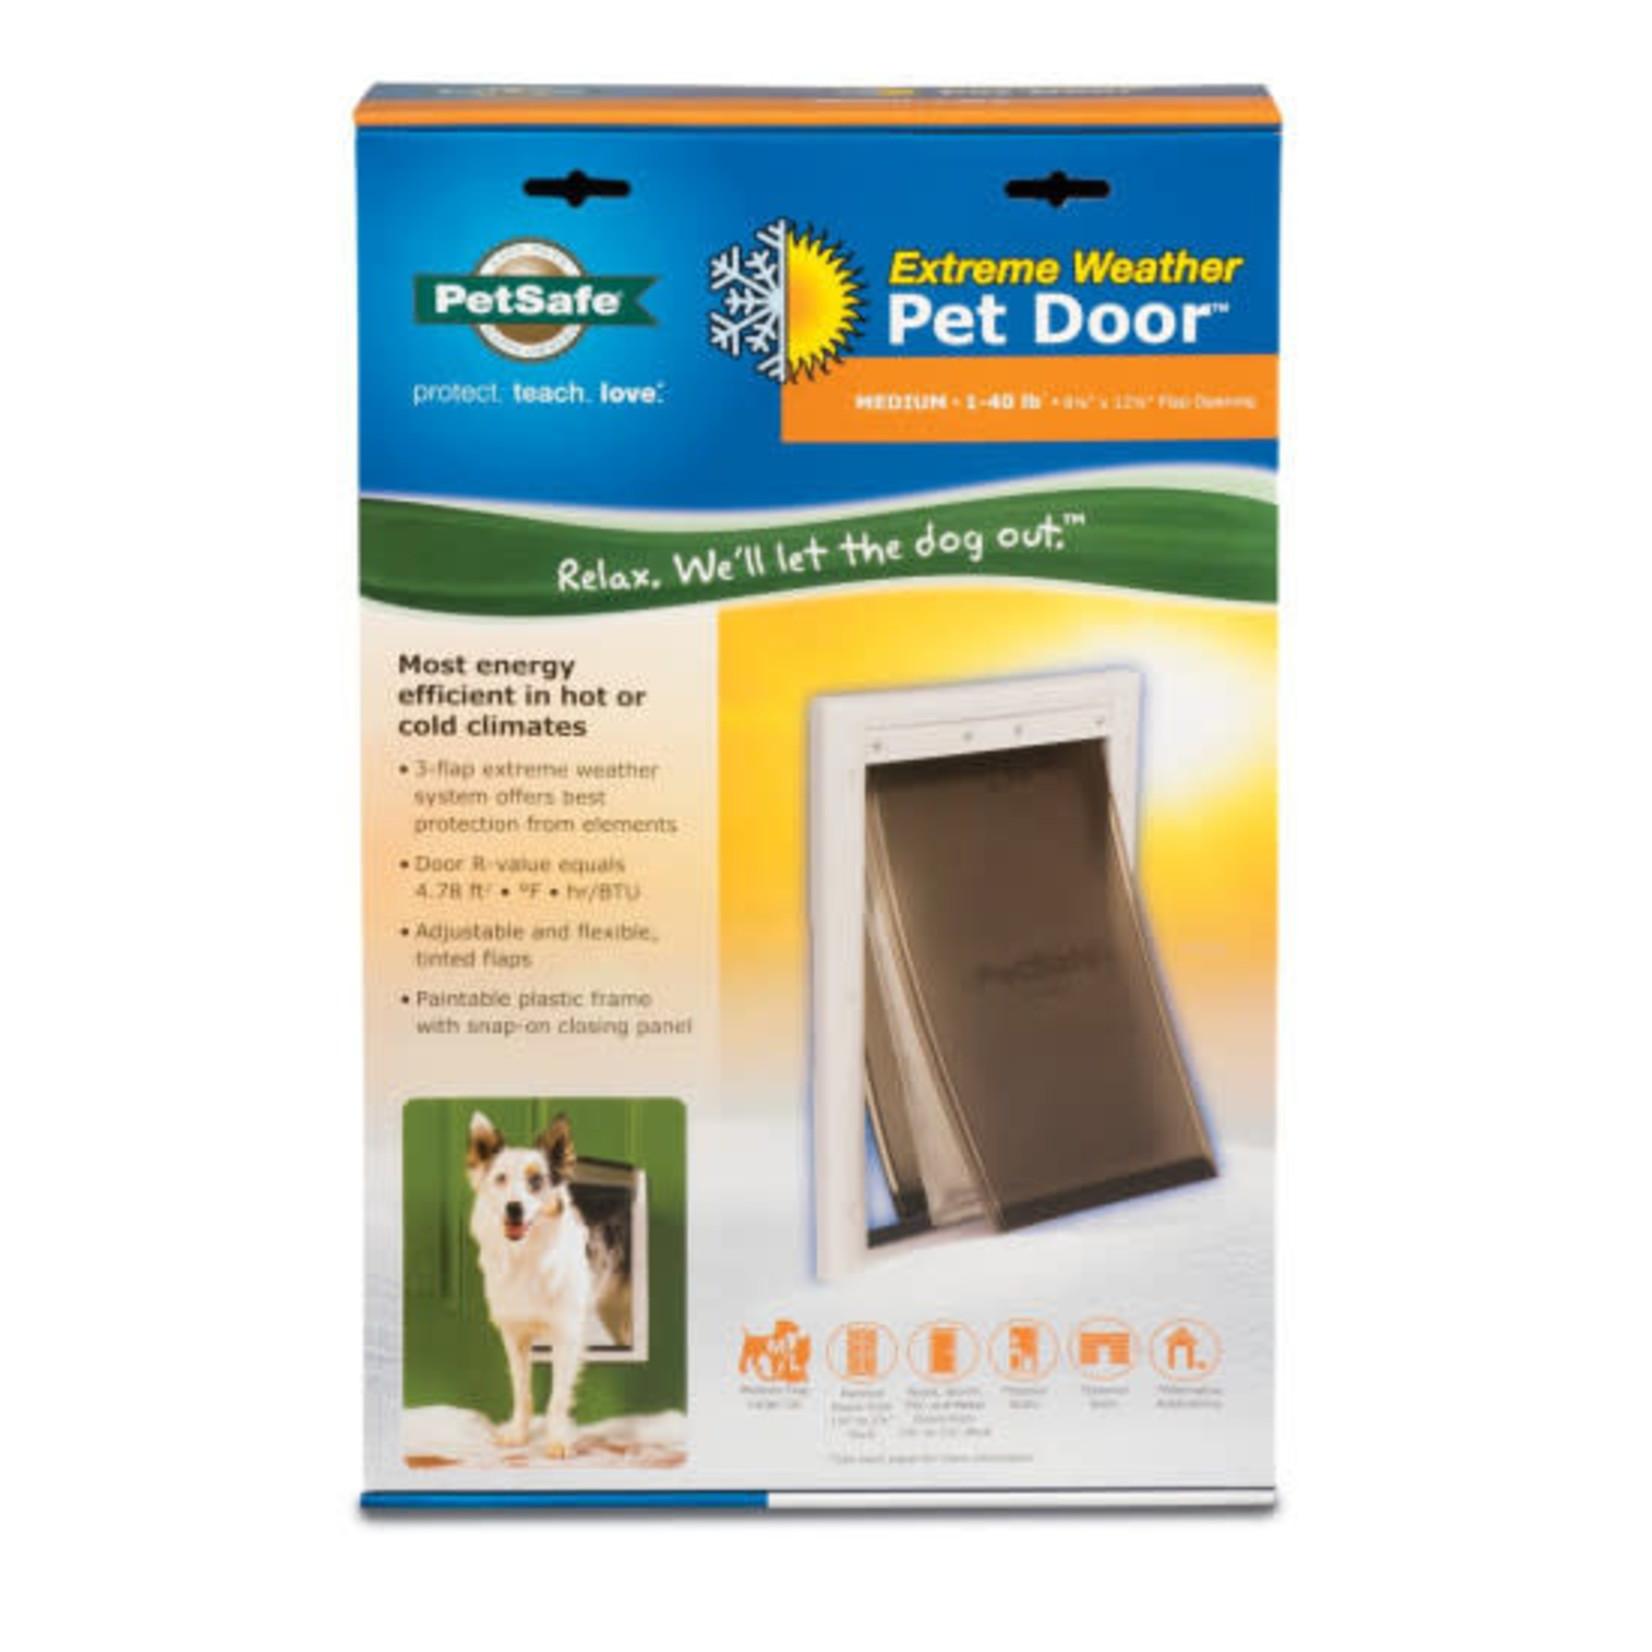 PetSafe  Extreme Weather Door 8 1/8'' x 12 1/4'' Flap Opening